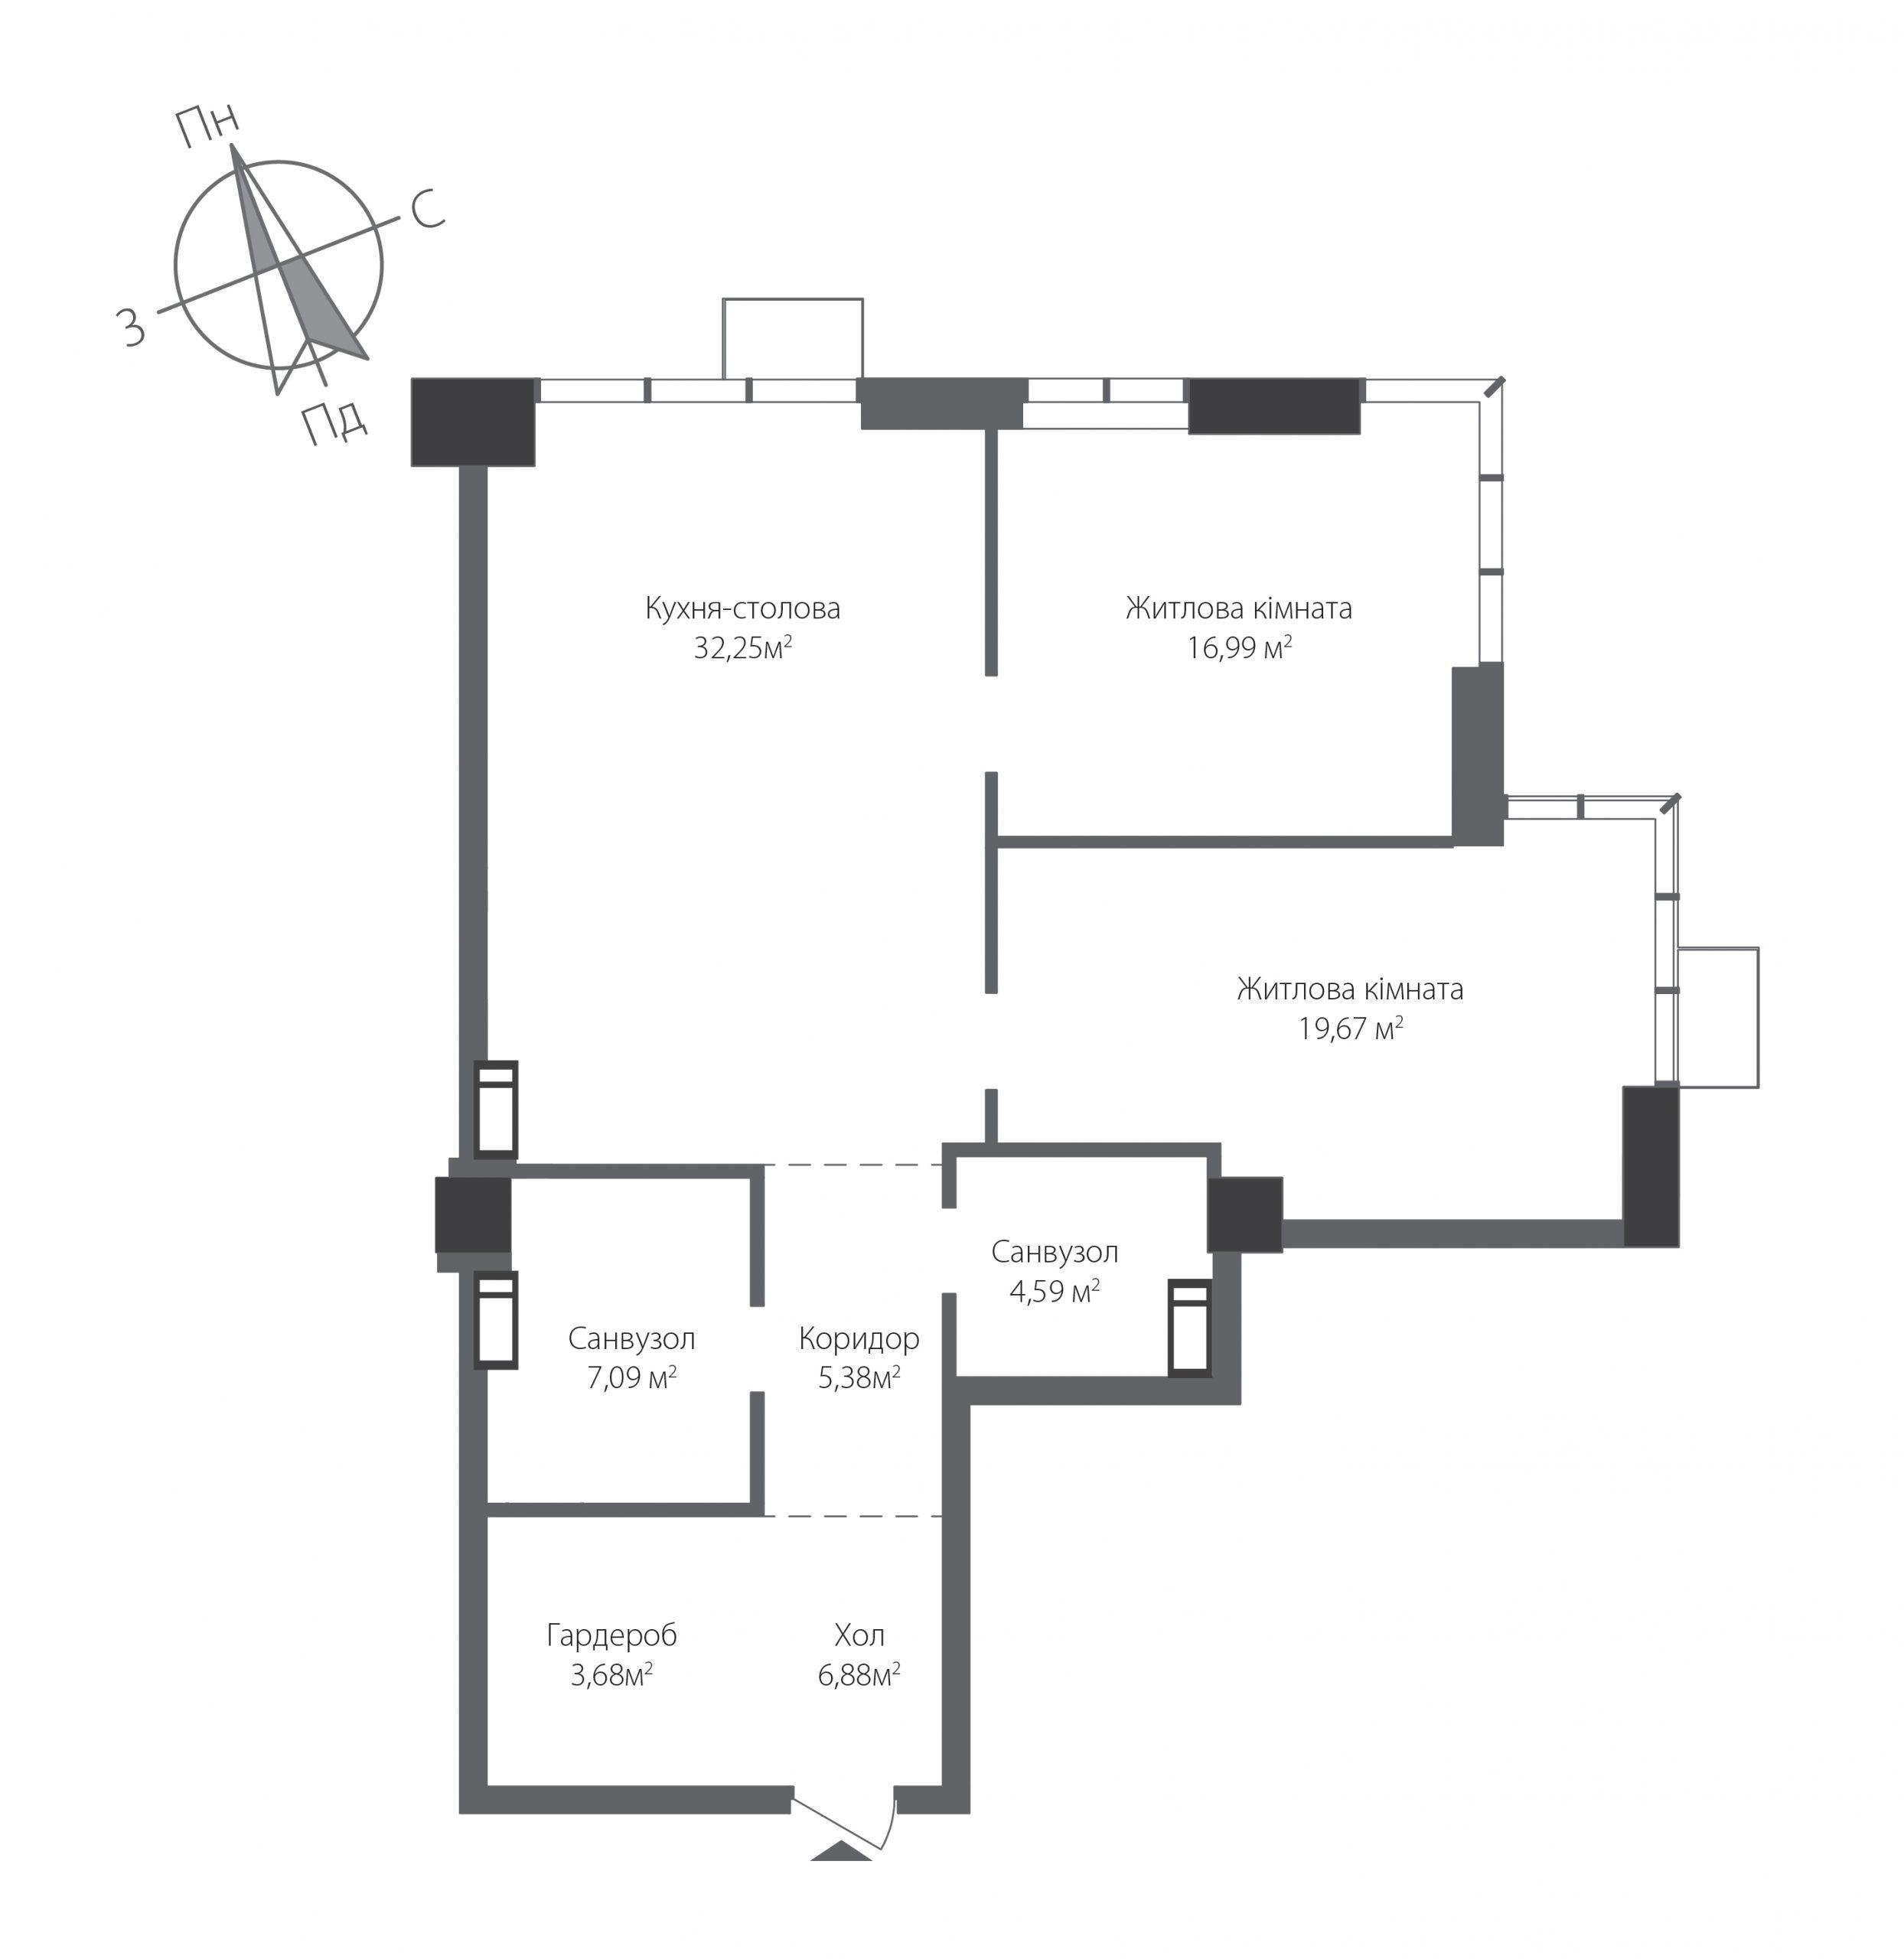 Двокімнатна квартира в ЖК RiverStone Номер квартири №16, Будинок 9, Поверх 16, Повна площа 96,53